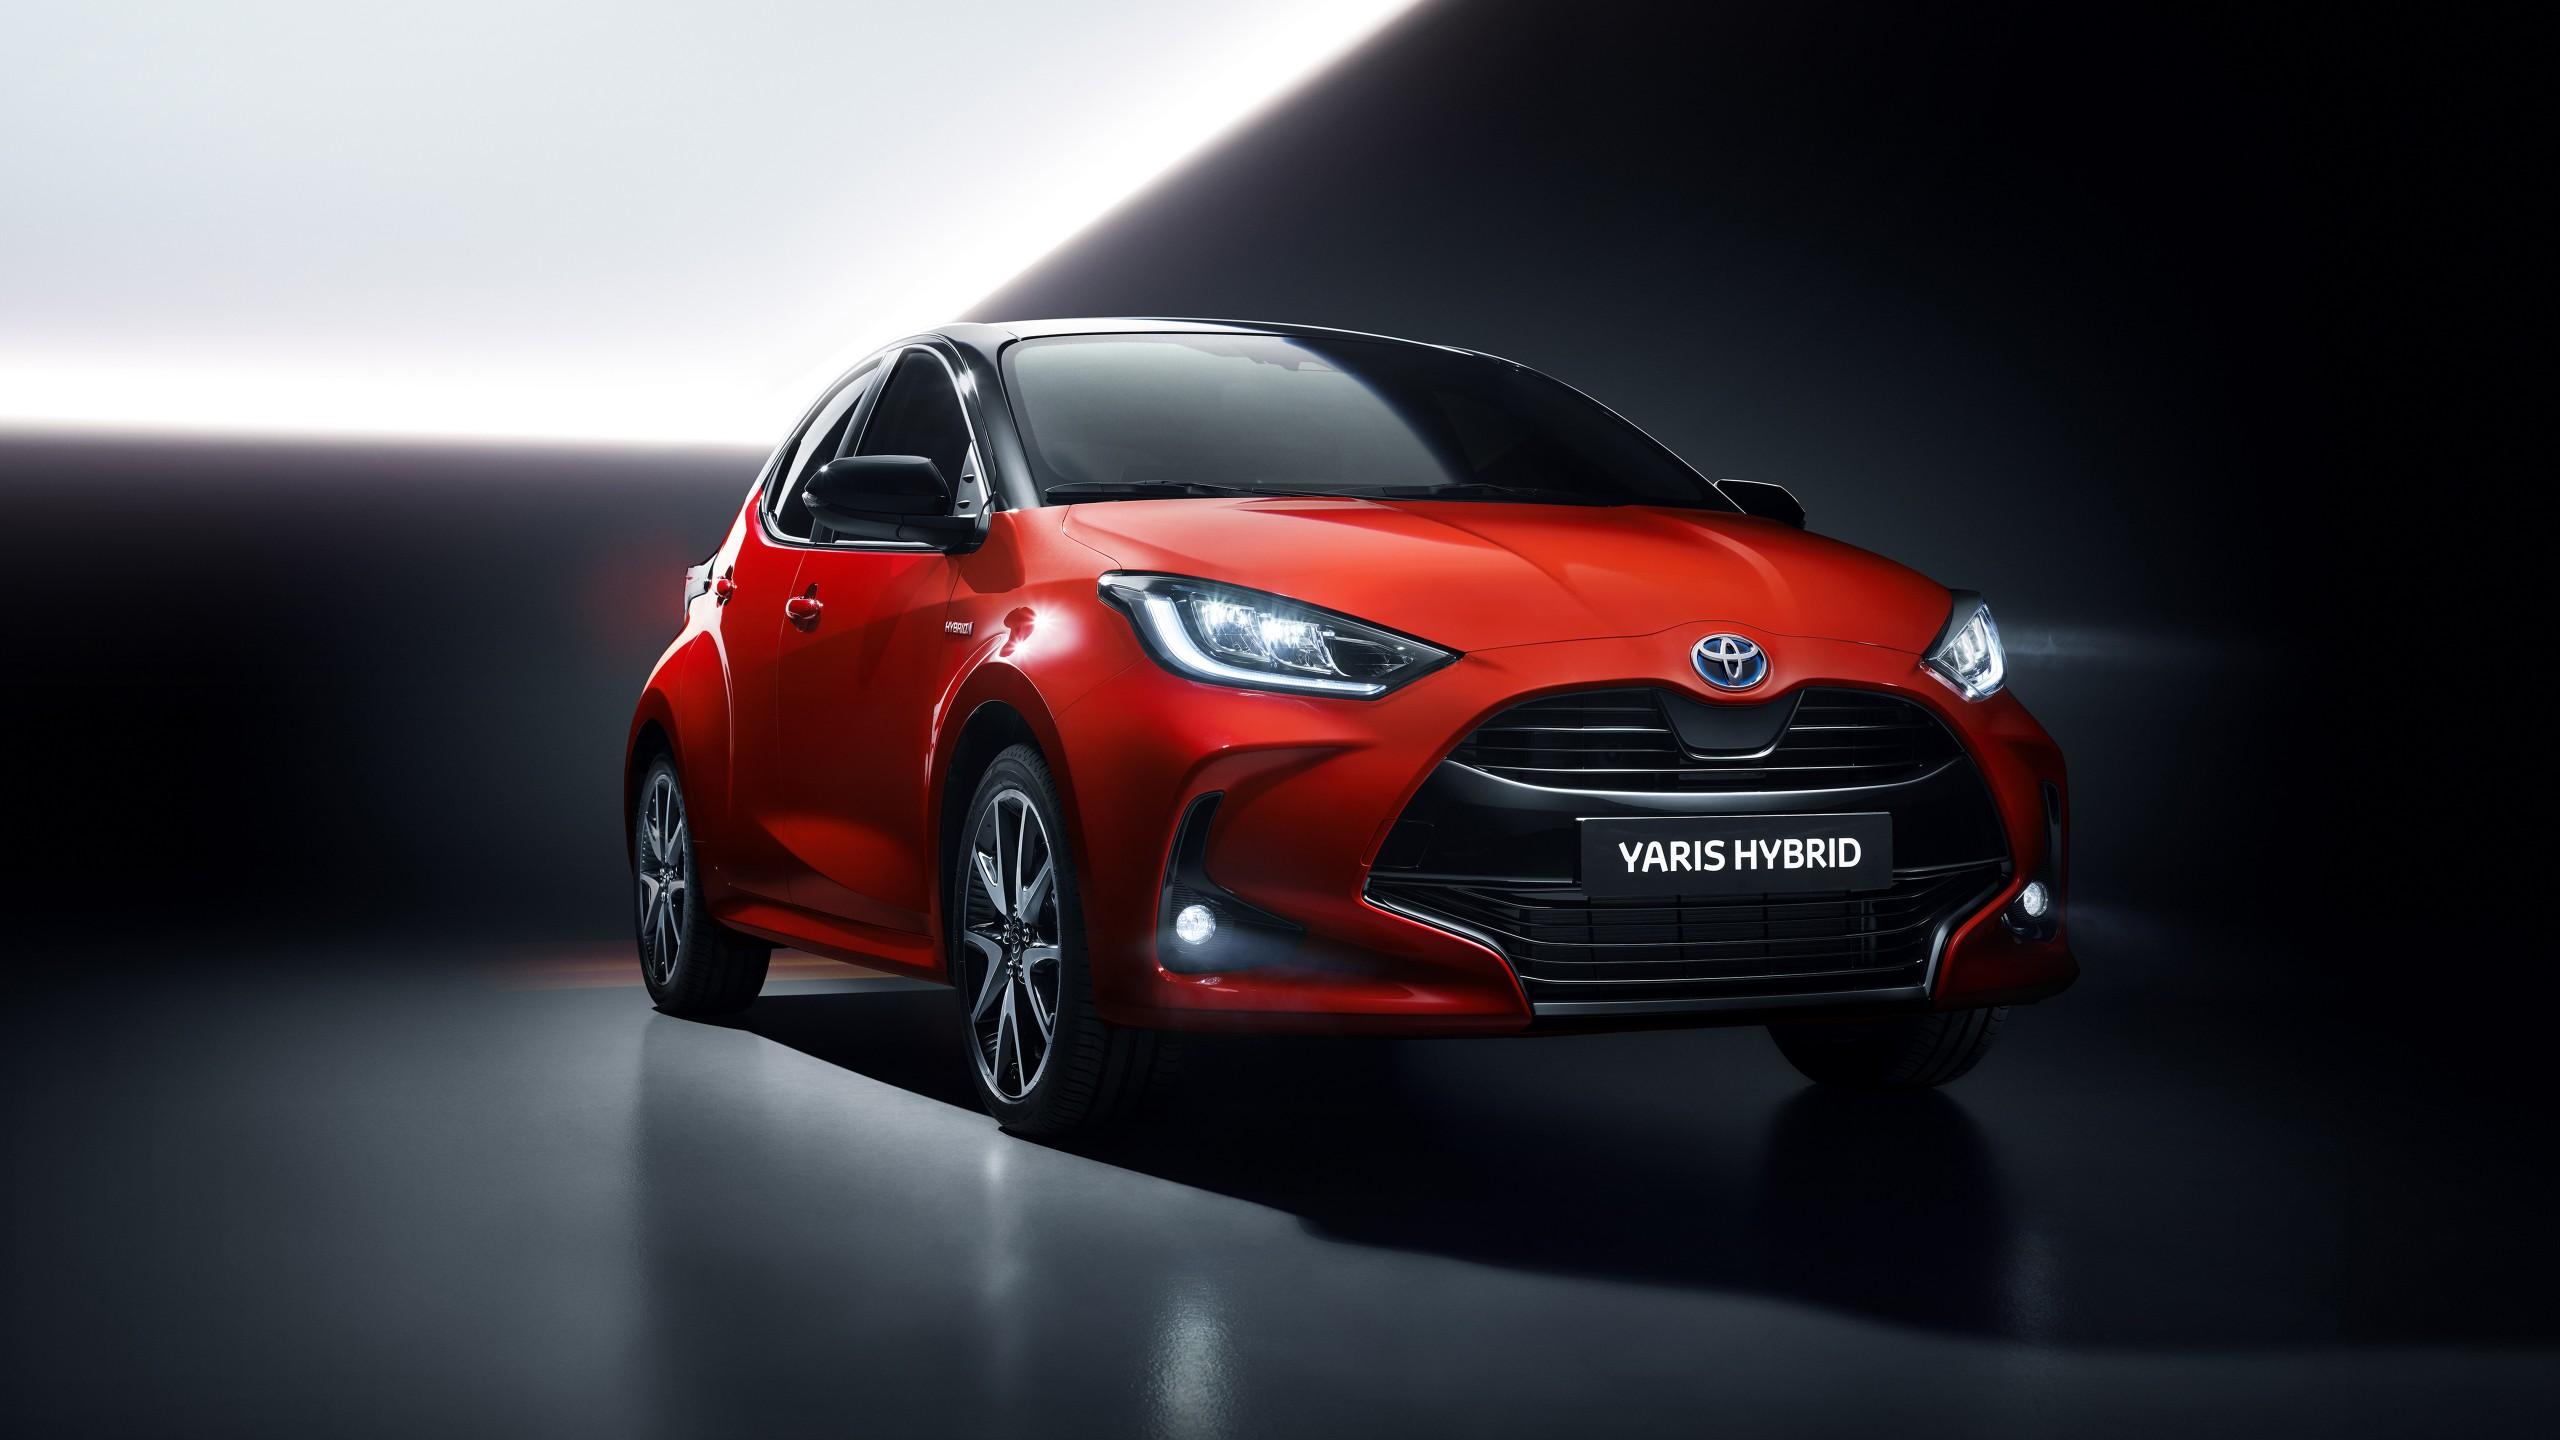 Toyota Yaris Hybrid 2020 5K Wallpaper | HD Car Wallpapers ...